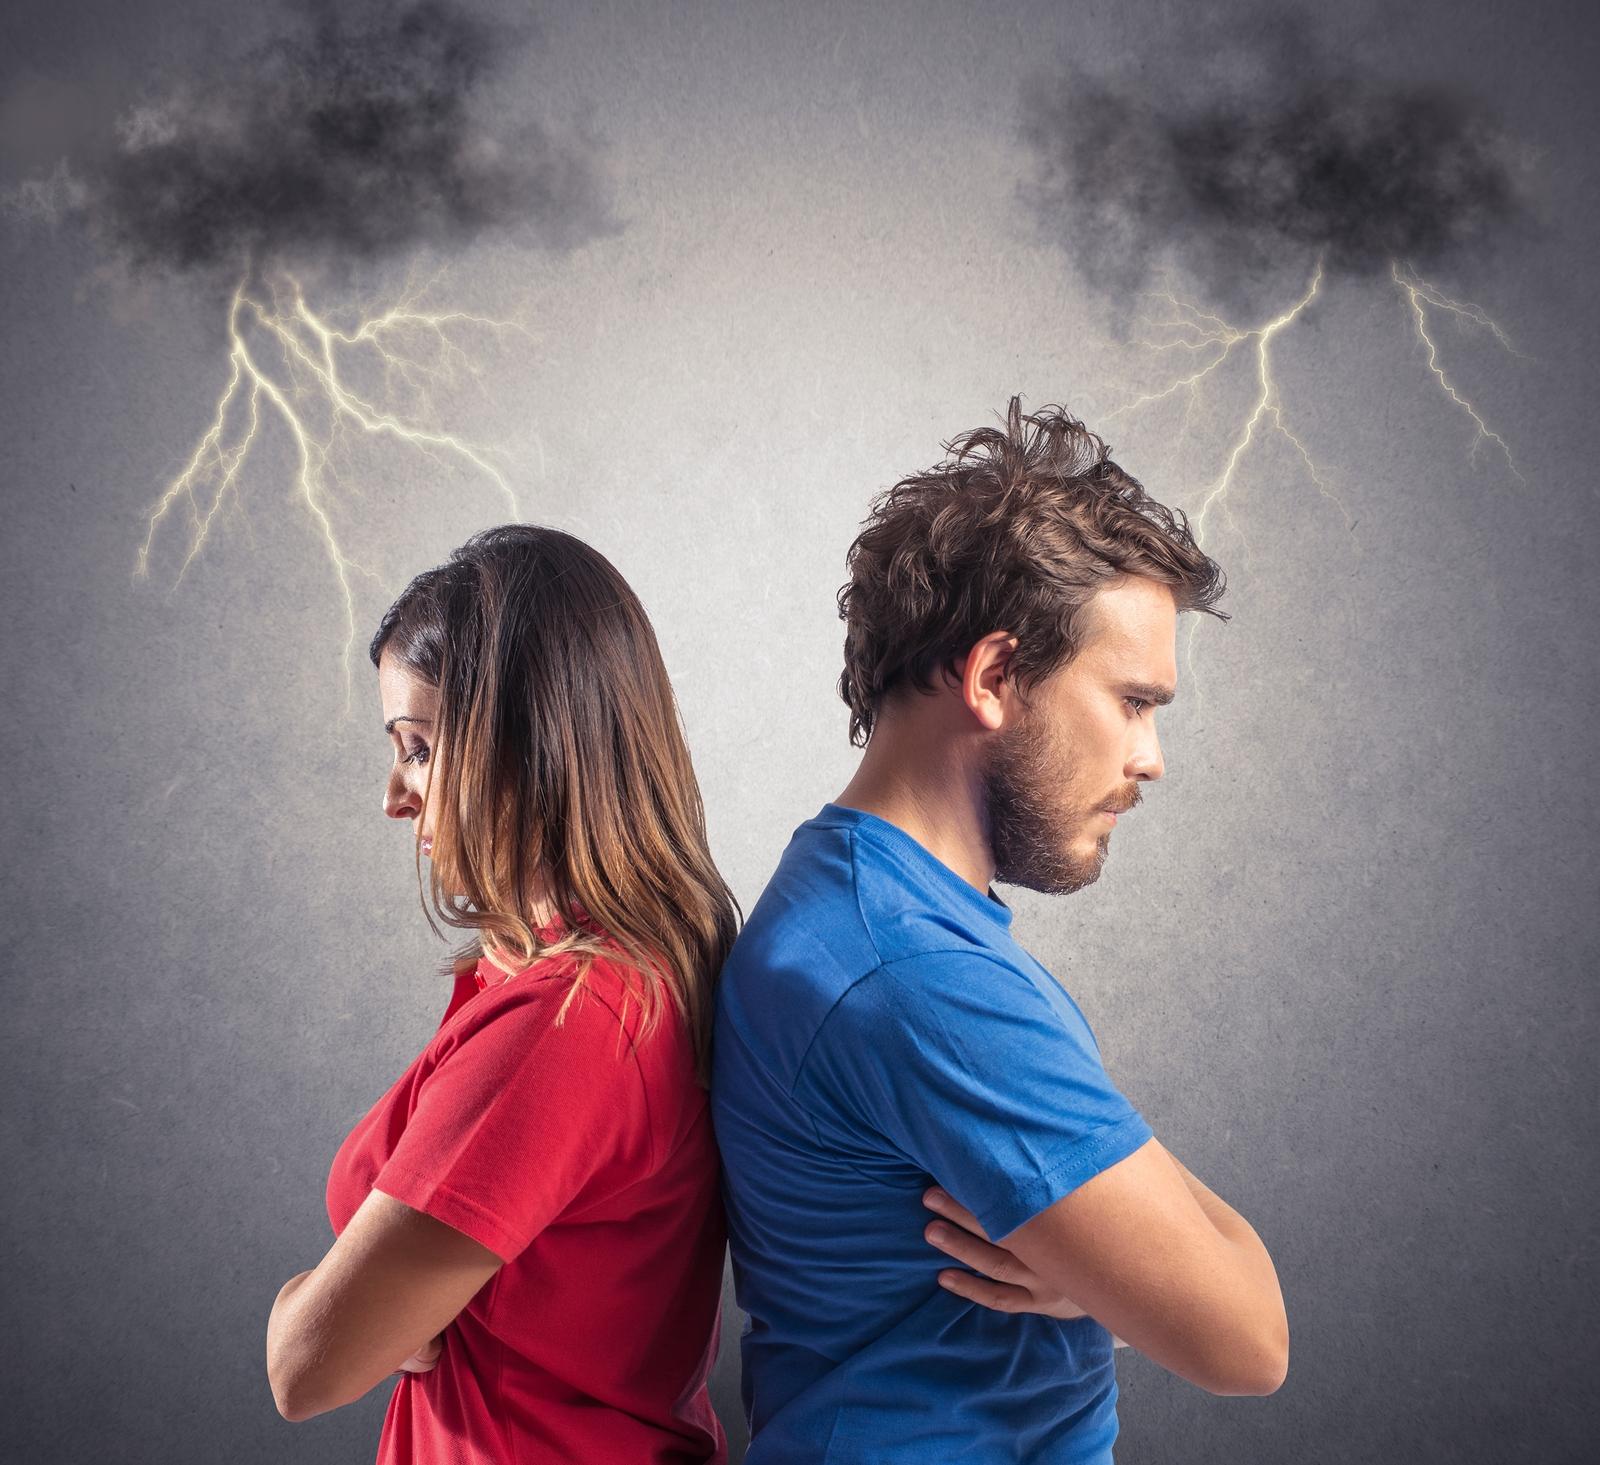 conflict in romantic relationship